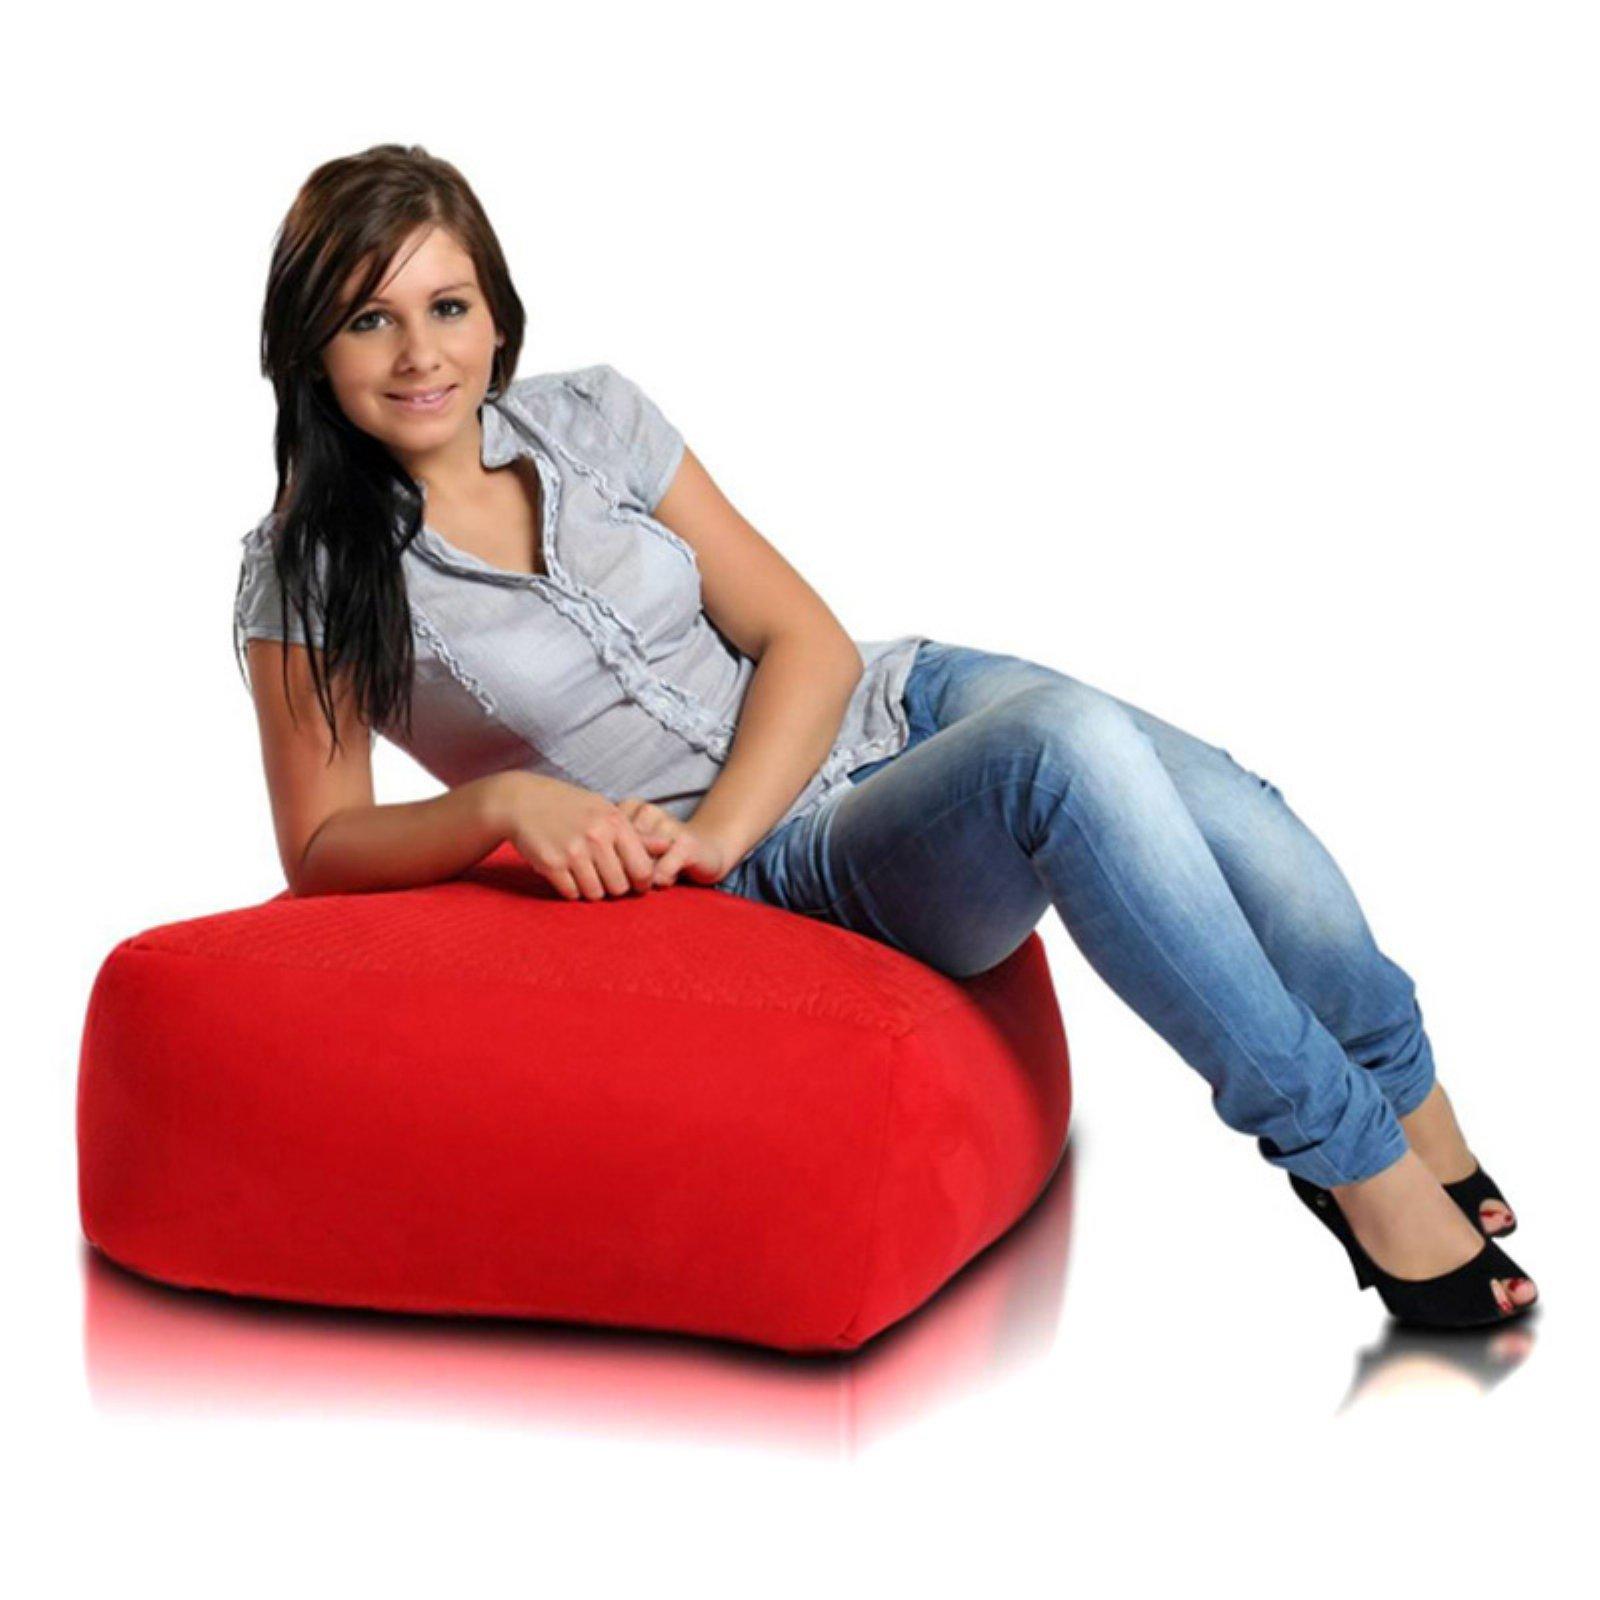 Turbo Beanbags Cubo Premium Bean Bag Chair - Red